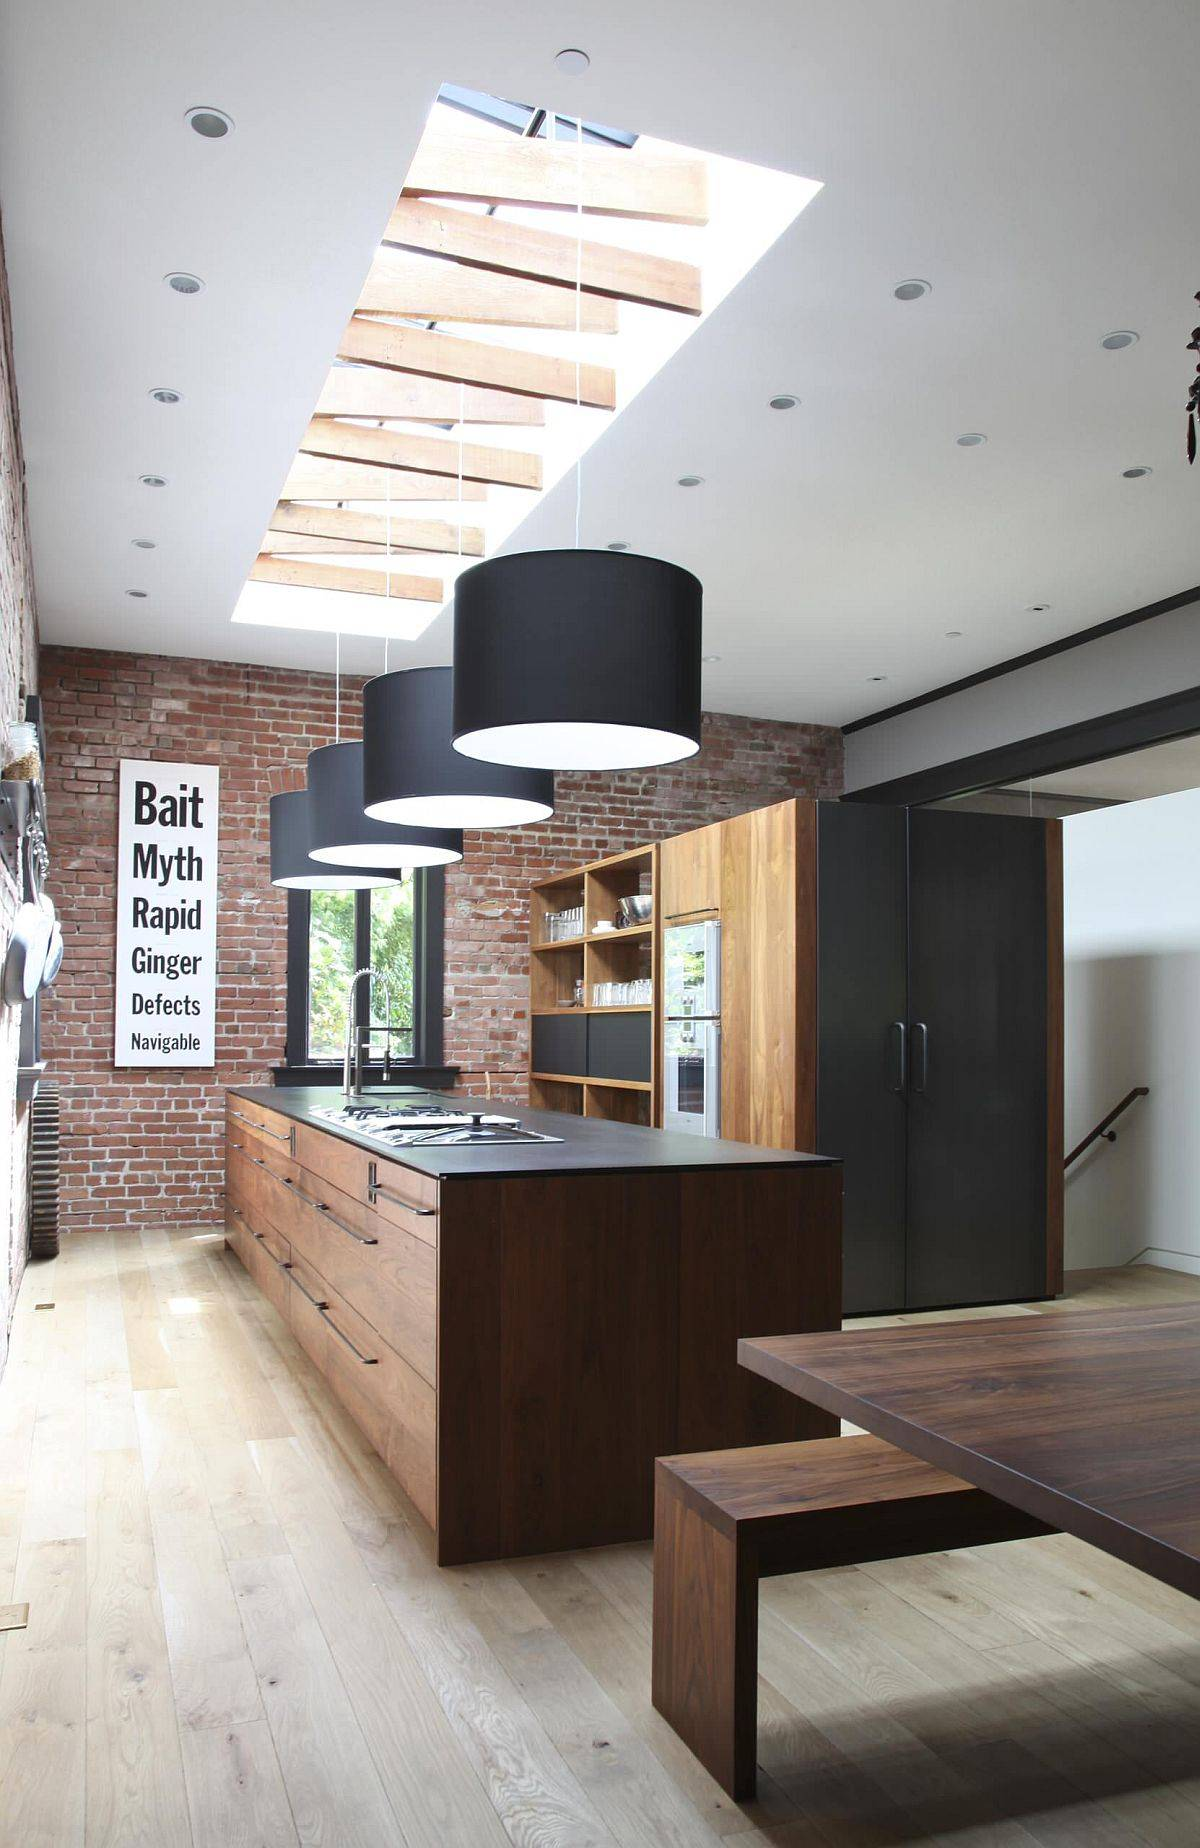 Combing-natural-light-with-artifcial-lighting-fixtures-usind-skylight-and-drum-pendants-91445